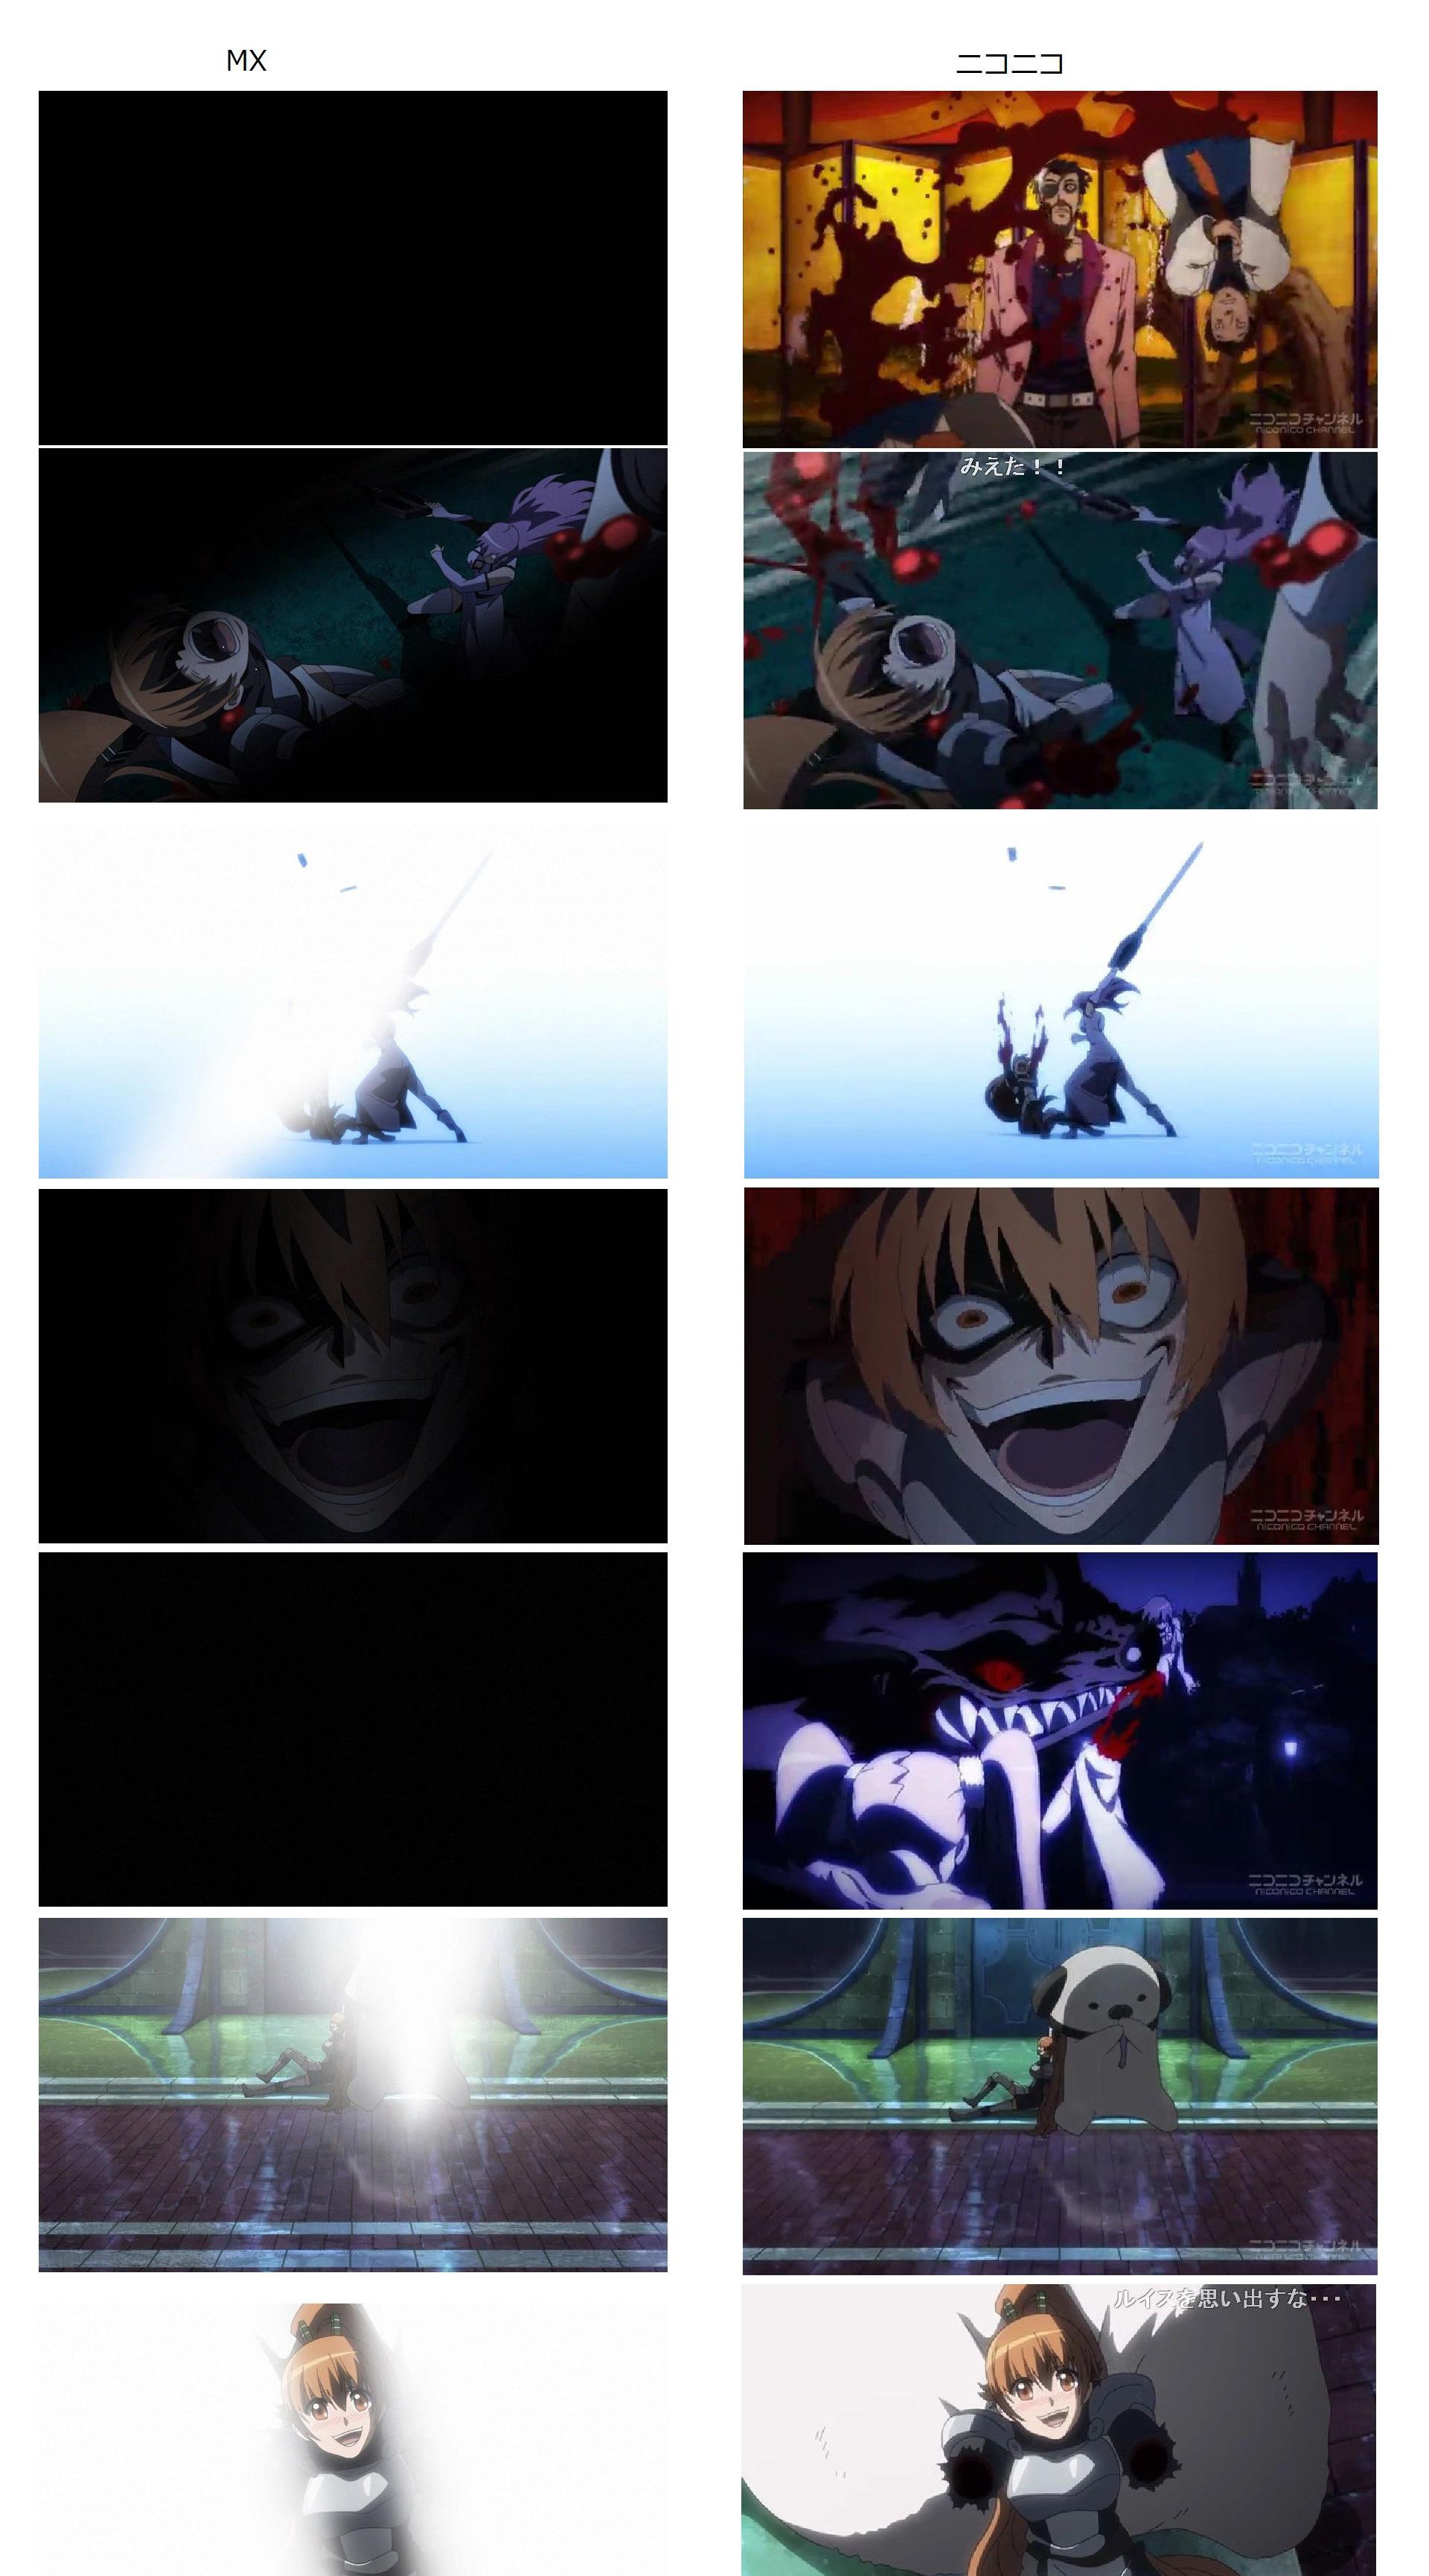 Akame-ga-Kill!-Episode-6-Uncensored-v-Censored